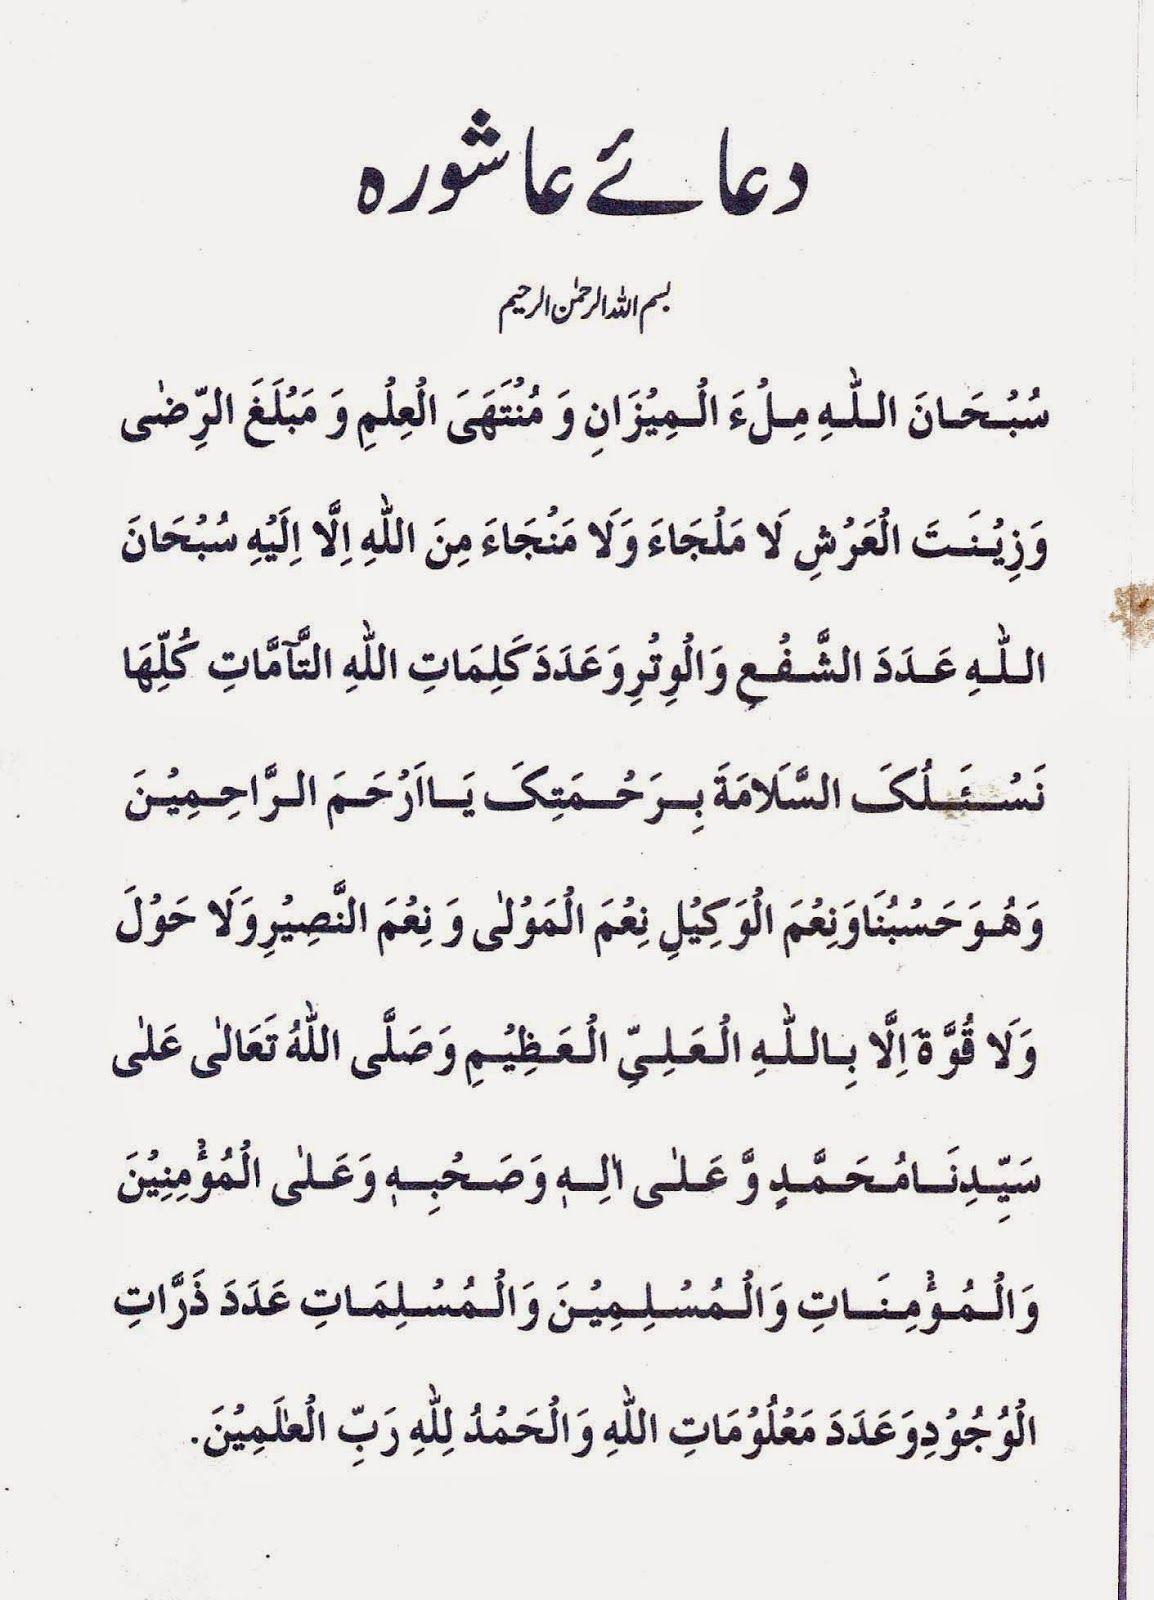 DuaeAshura Happy islamic new year, Dua, Islam